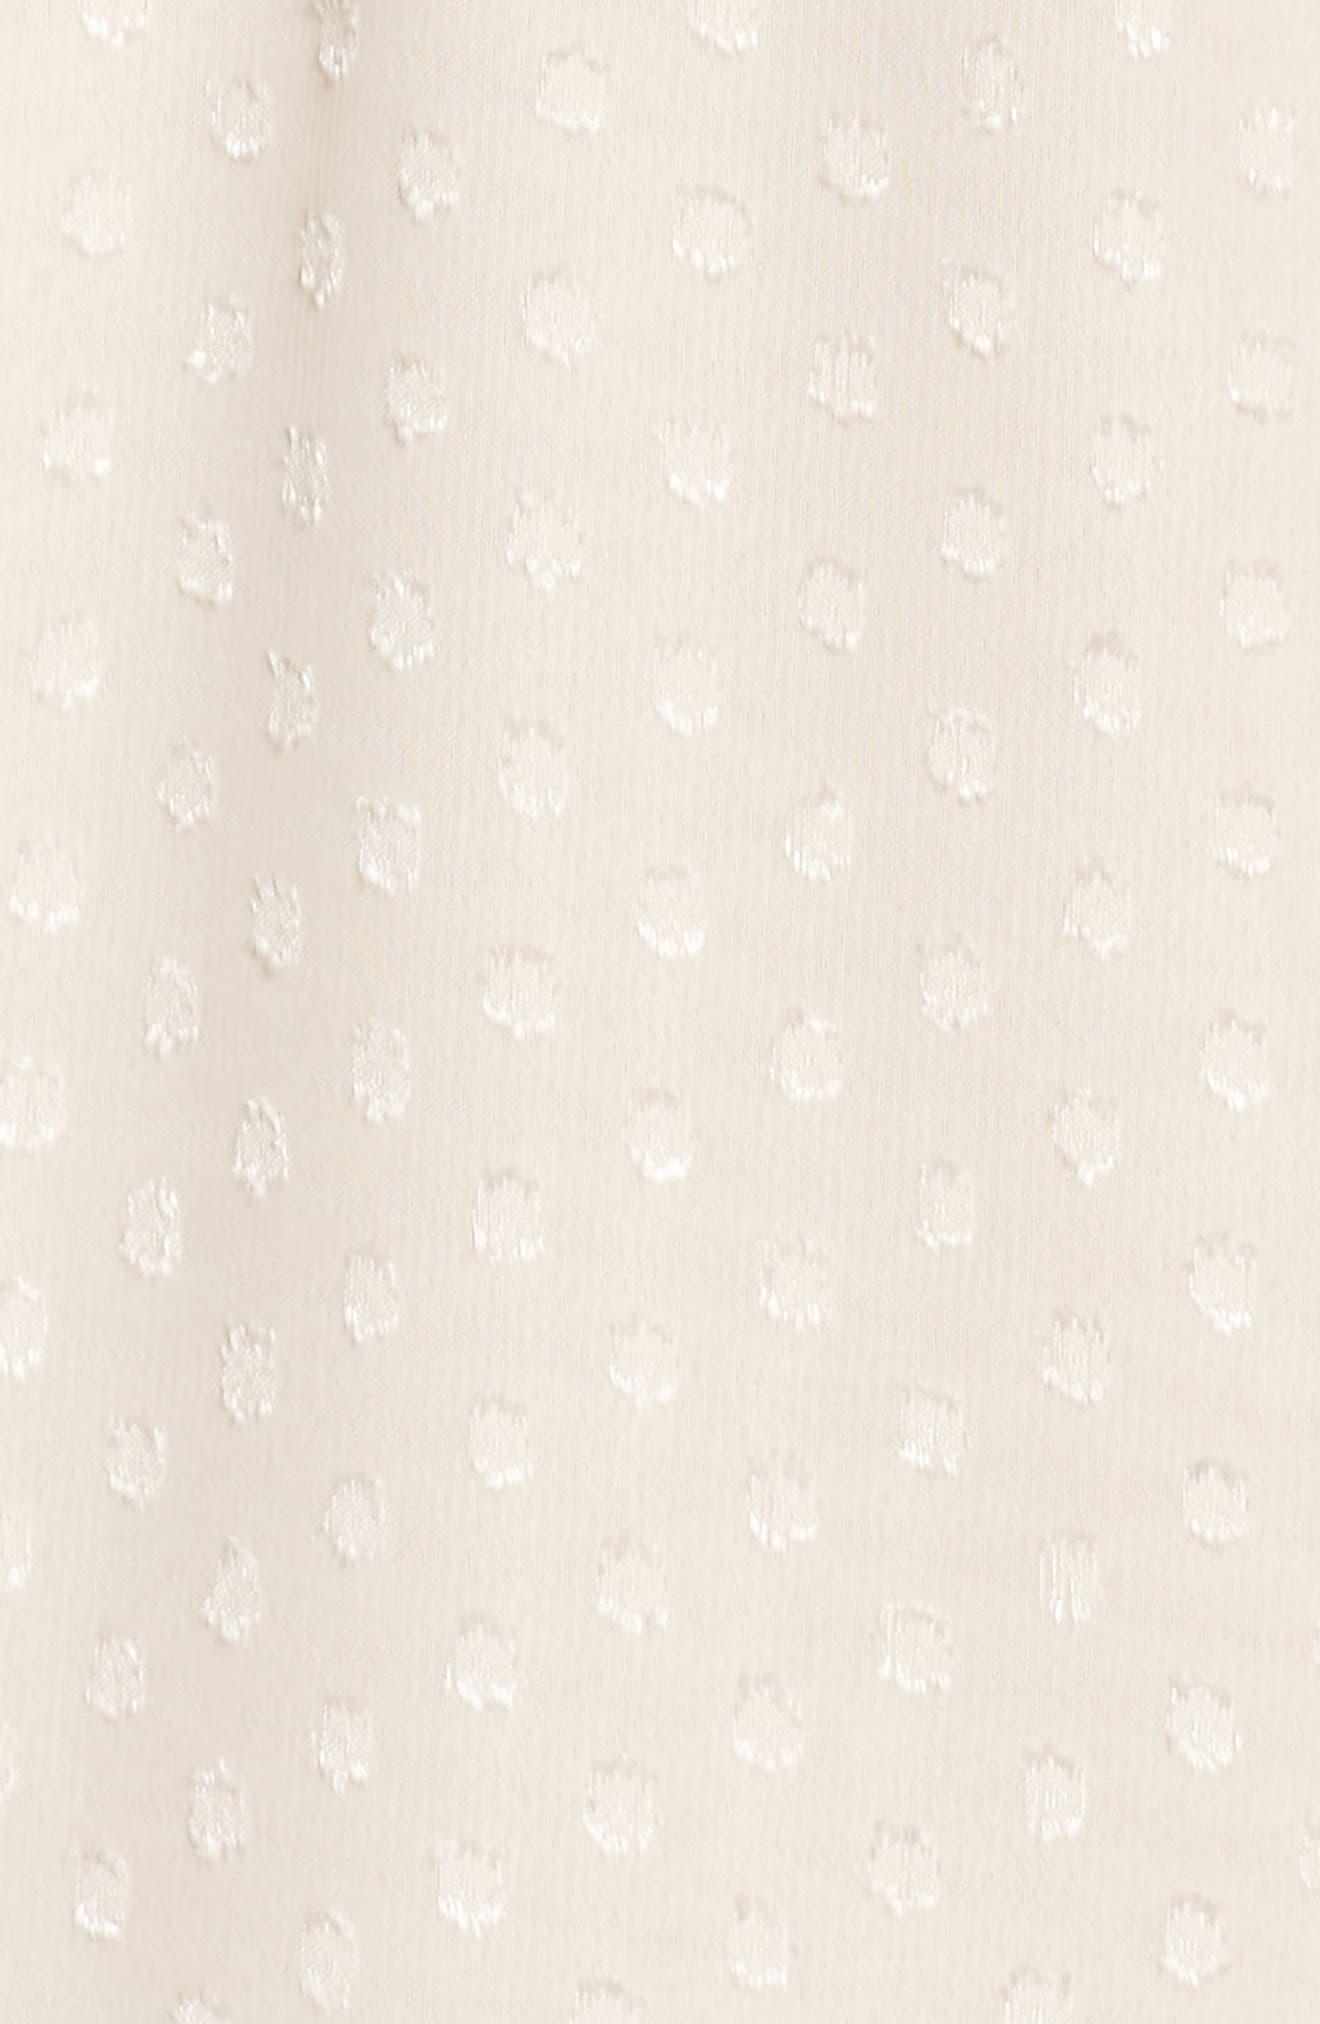 Tie Sleeve Cold Shoulder Maxi Dress,                             Alternate thumbnail 6, color,                             901